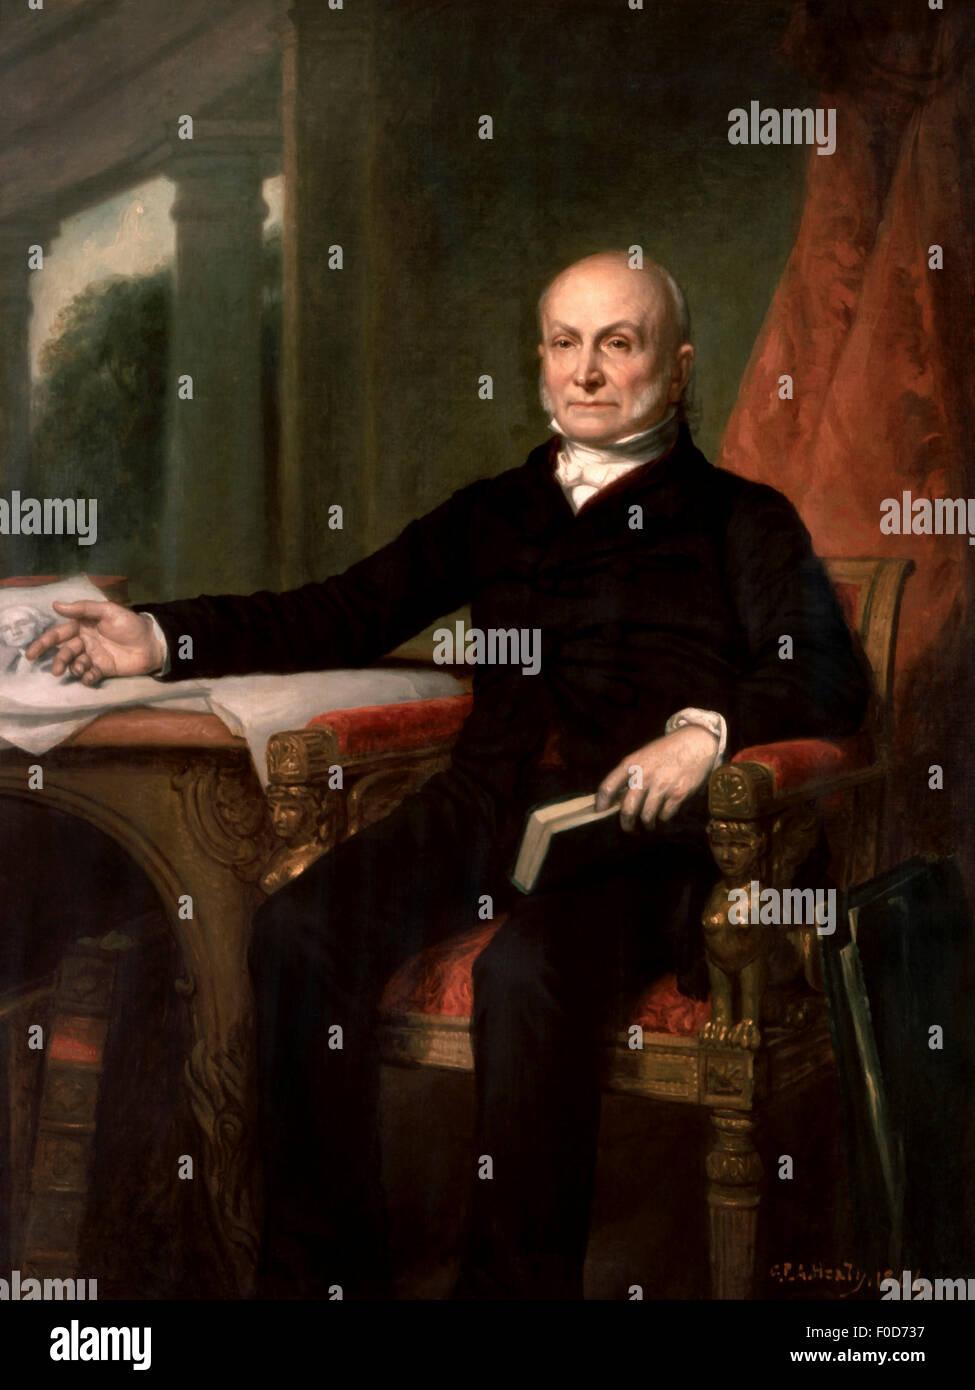 Vintage American history painting of President John Quincy Adams. Original by George Peter Alexander Healy. Stock Photo